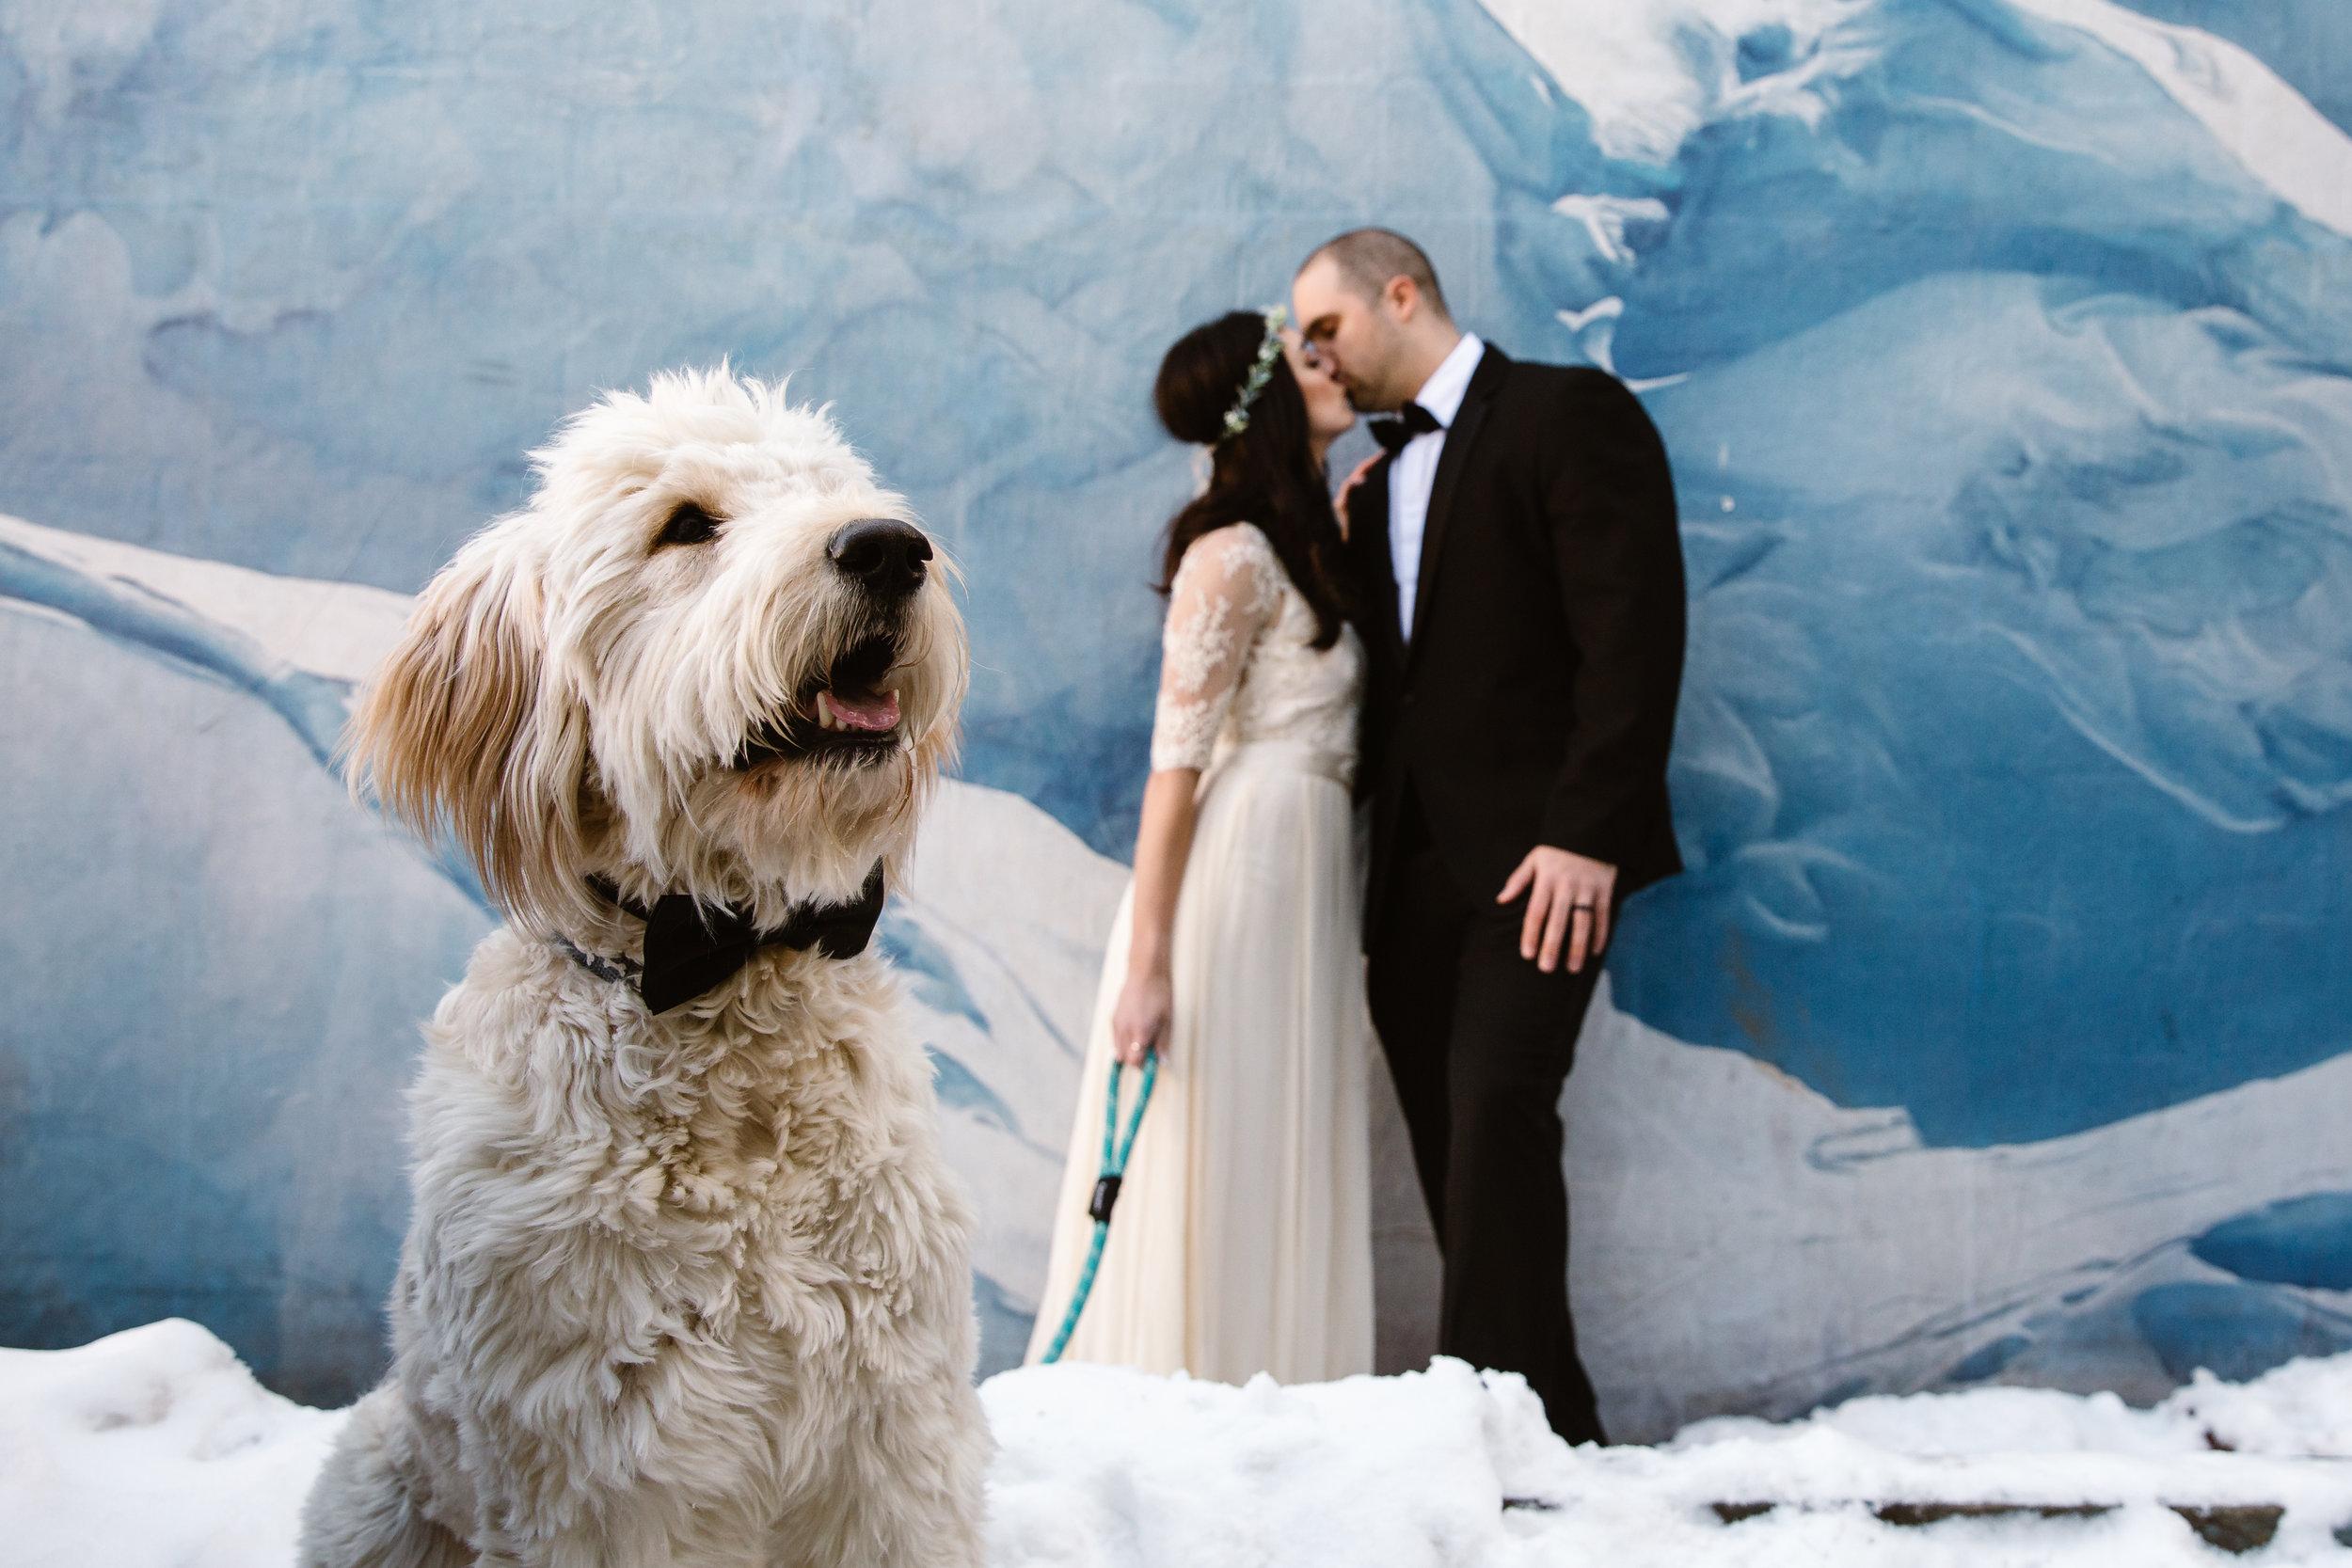 LD-Telluride-Wedding-Mountain-LeahandAshton-Photography-8.jpg